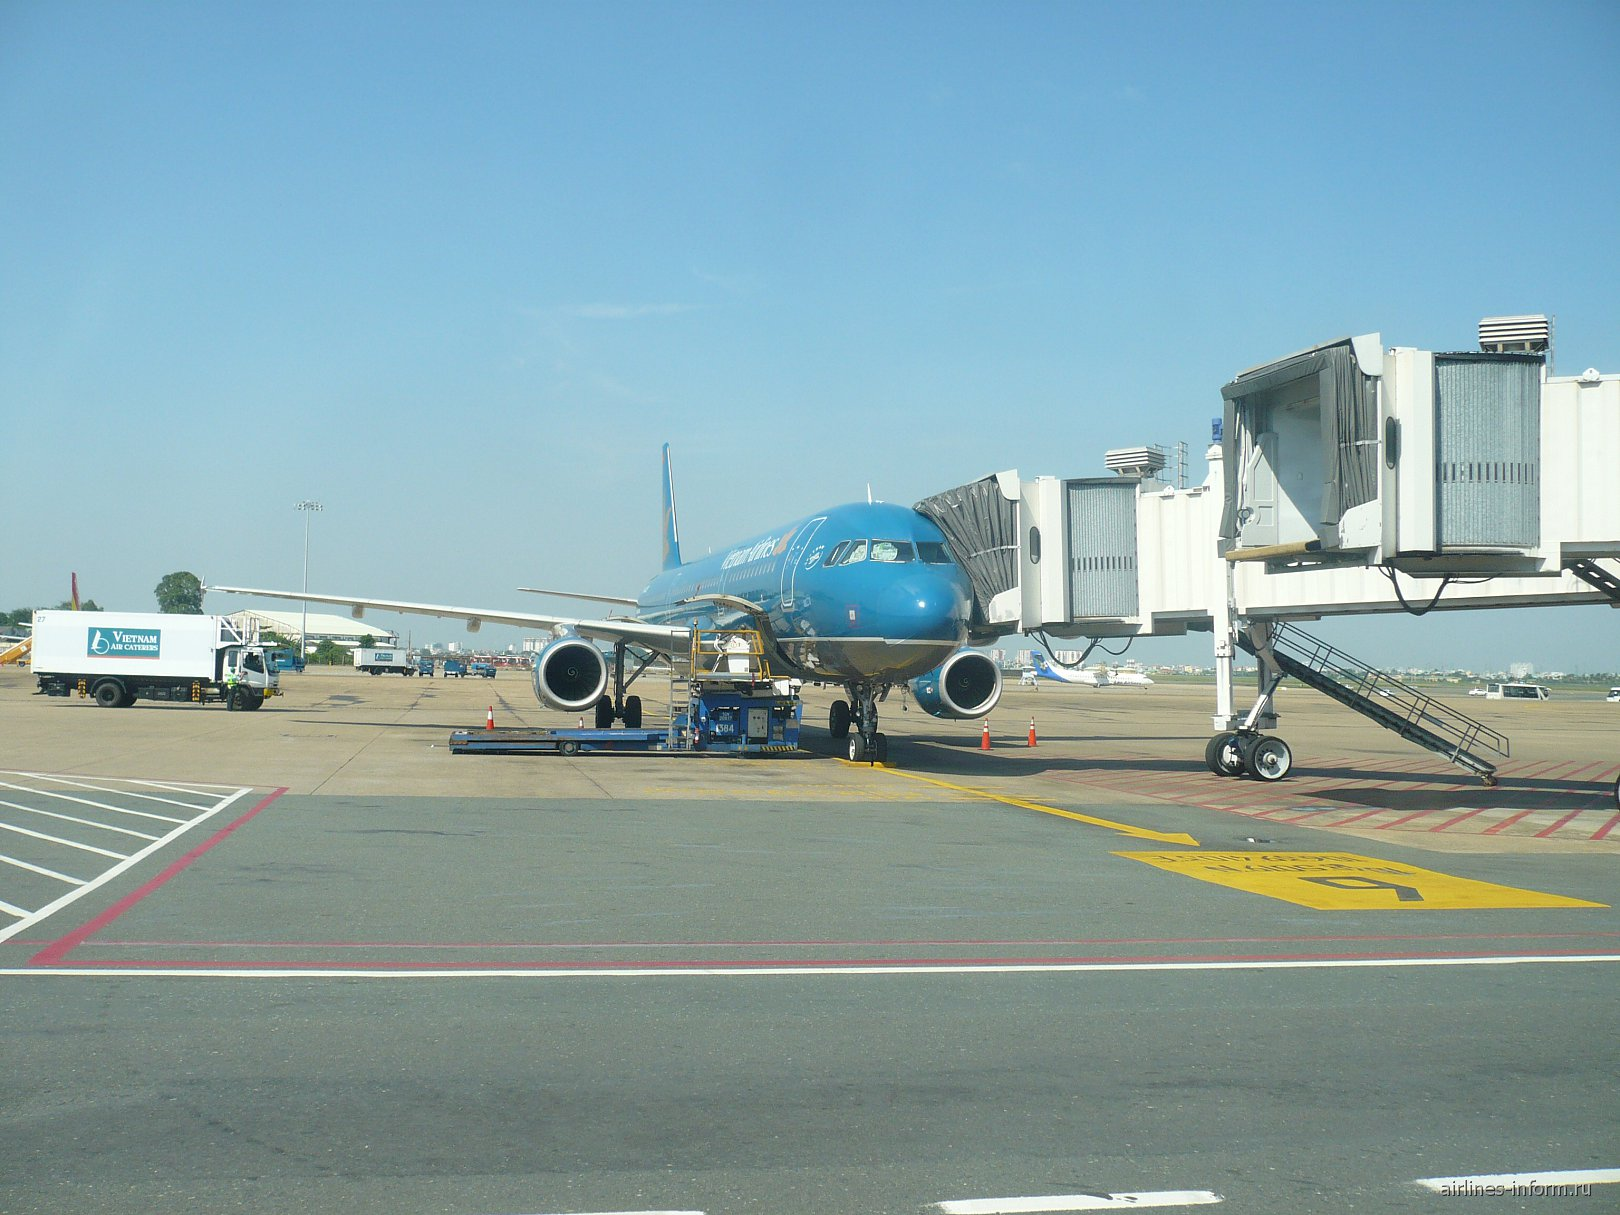 Airbus A321 Вьетнамских авиалиний в аэропорту Камрань